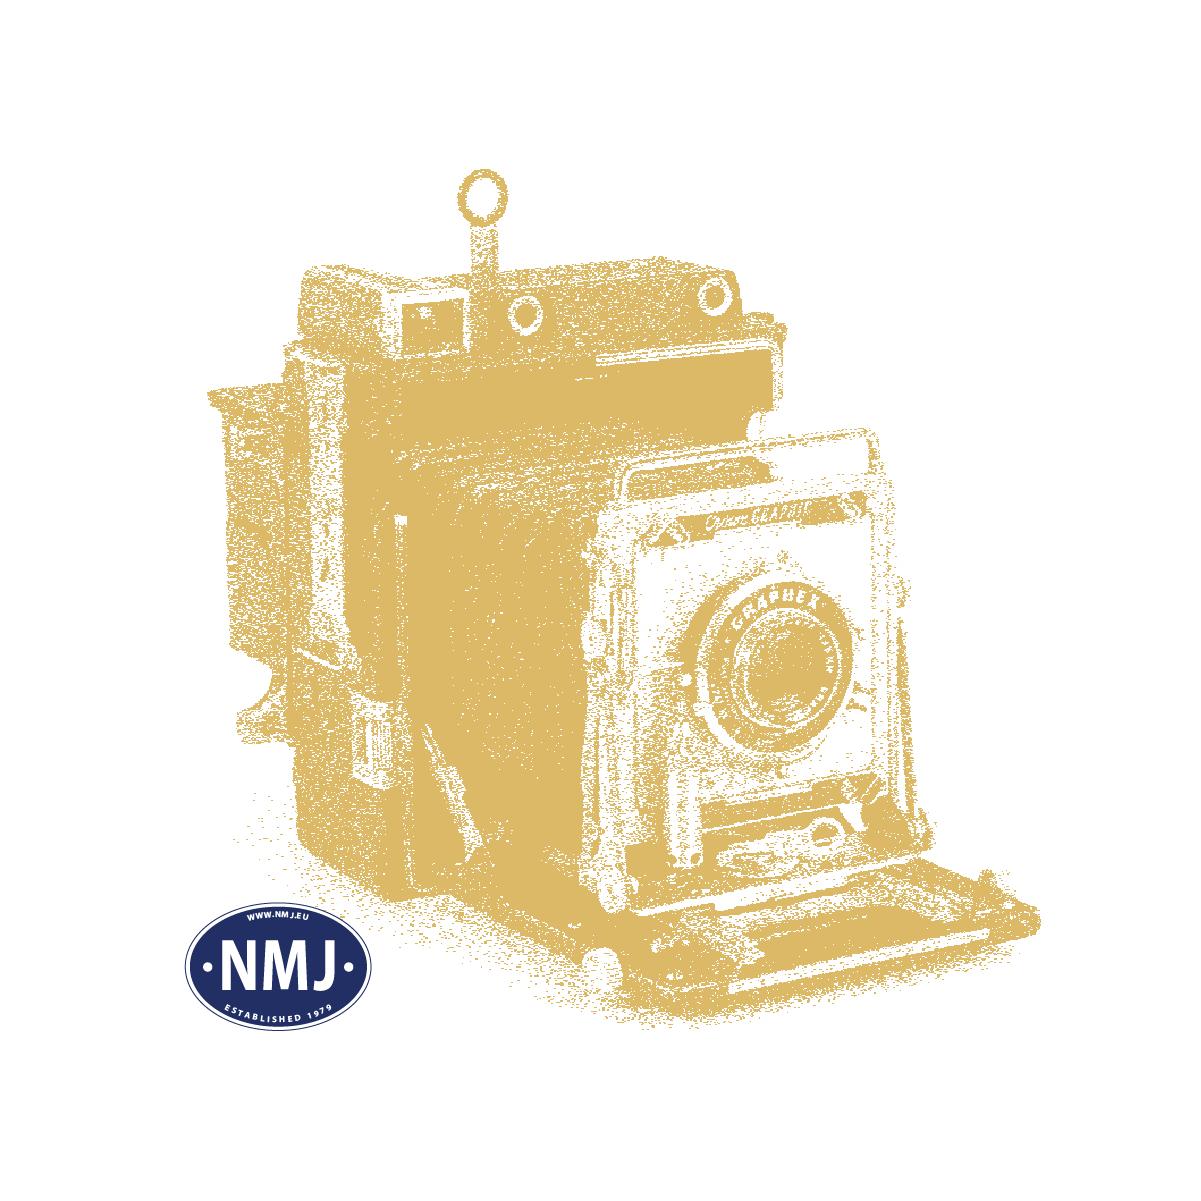 NMJT90503 - NMJ Topline Three T TMY 1110, DCC m/ Lyd